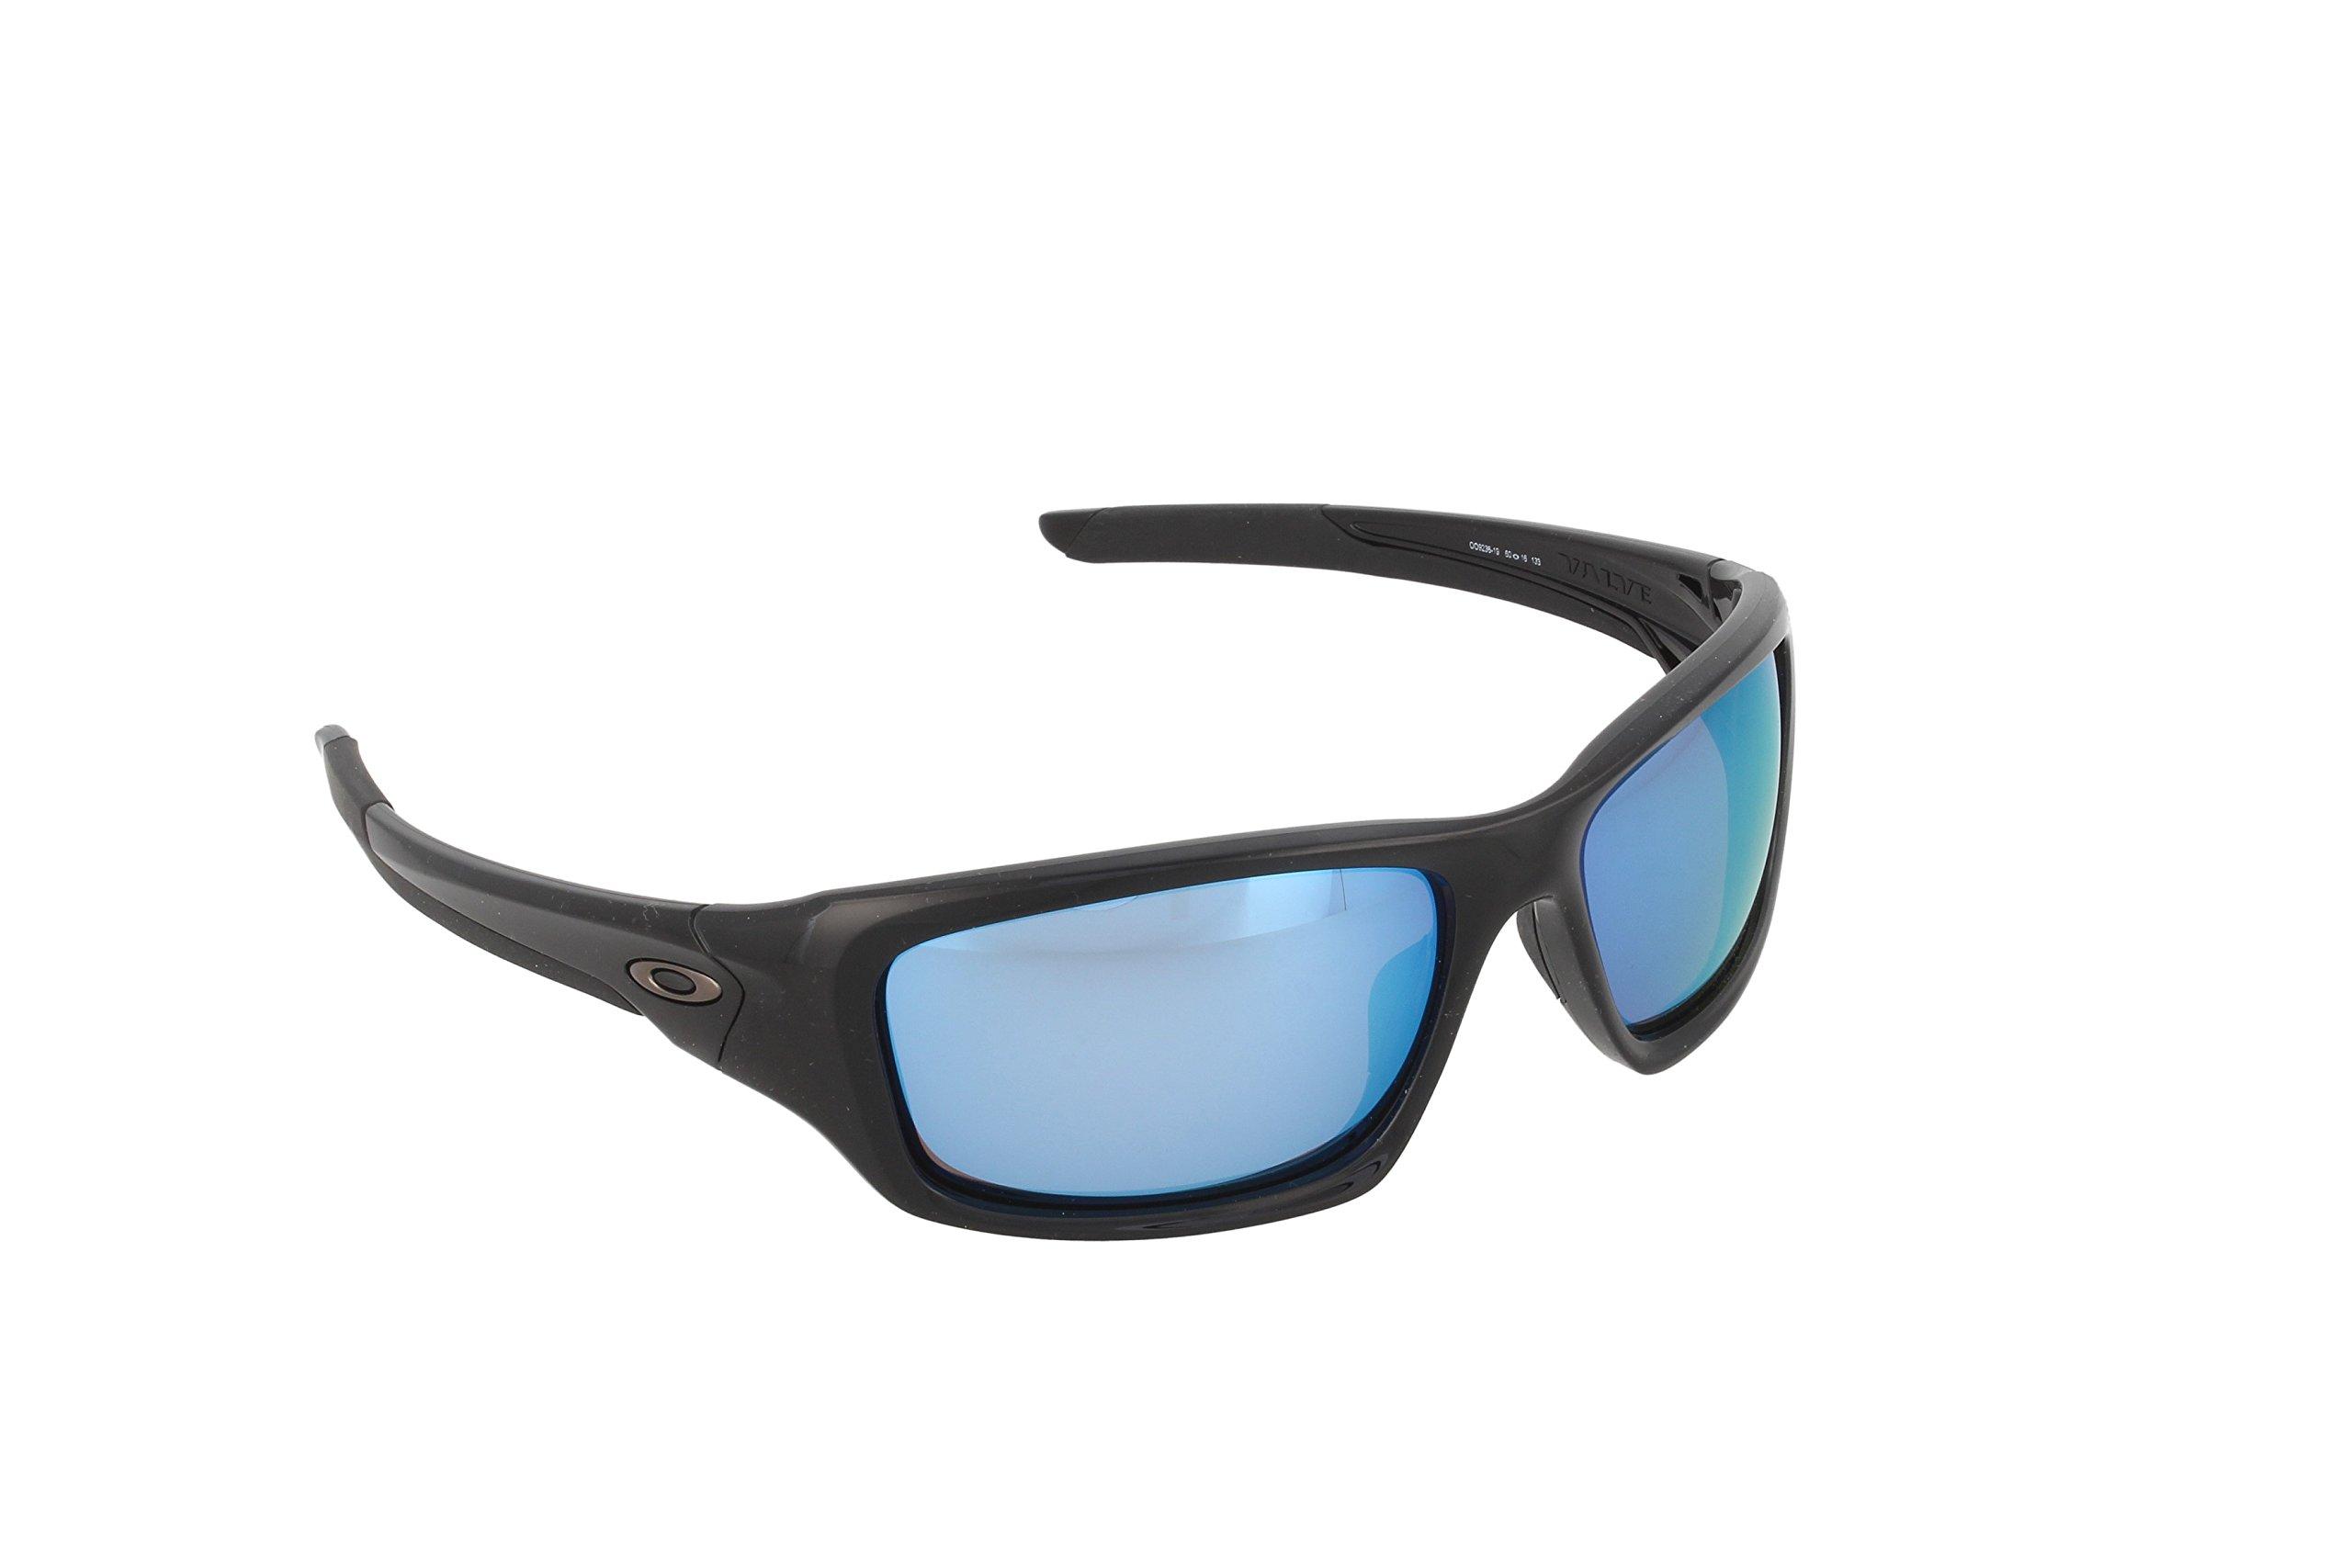 Oakley Men's Valve Polarized Rectangular Sunglasses, Polished Black, 60 mm